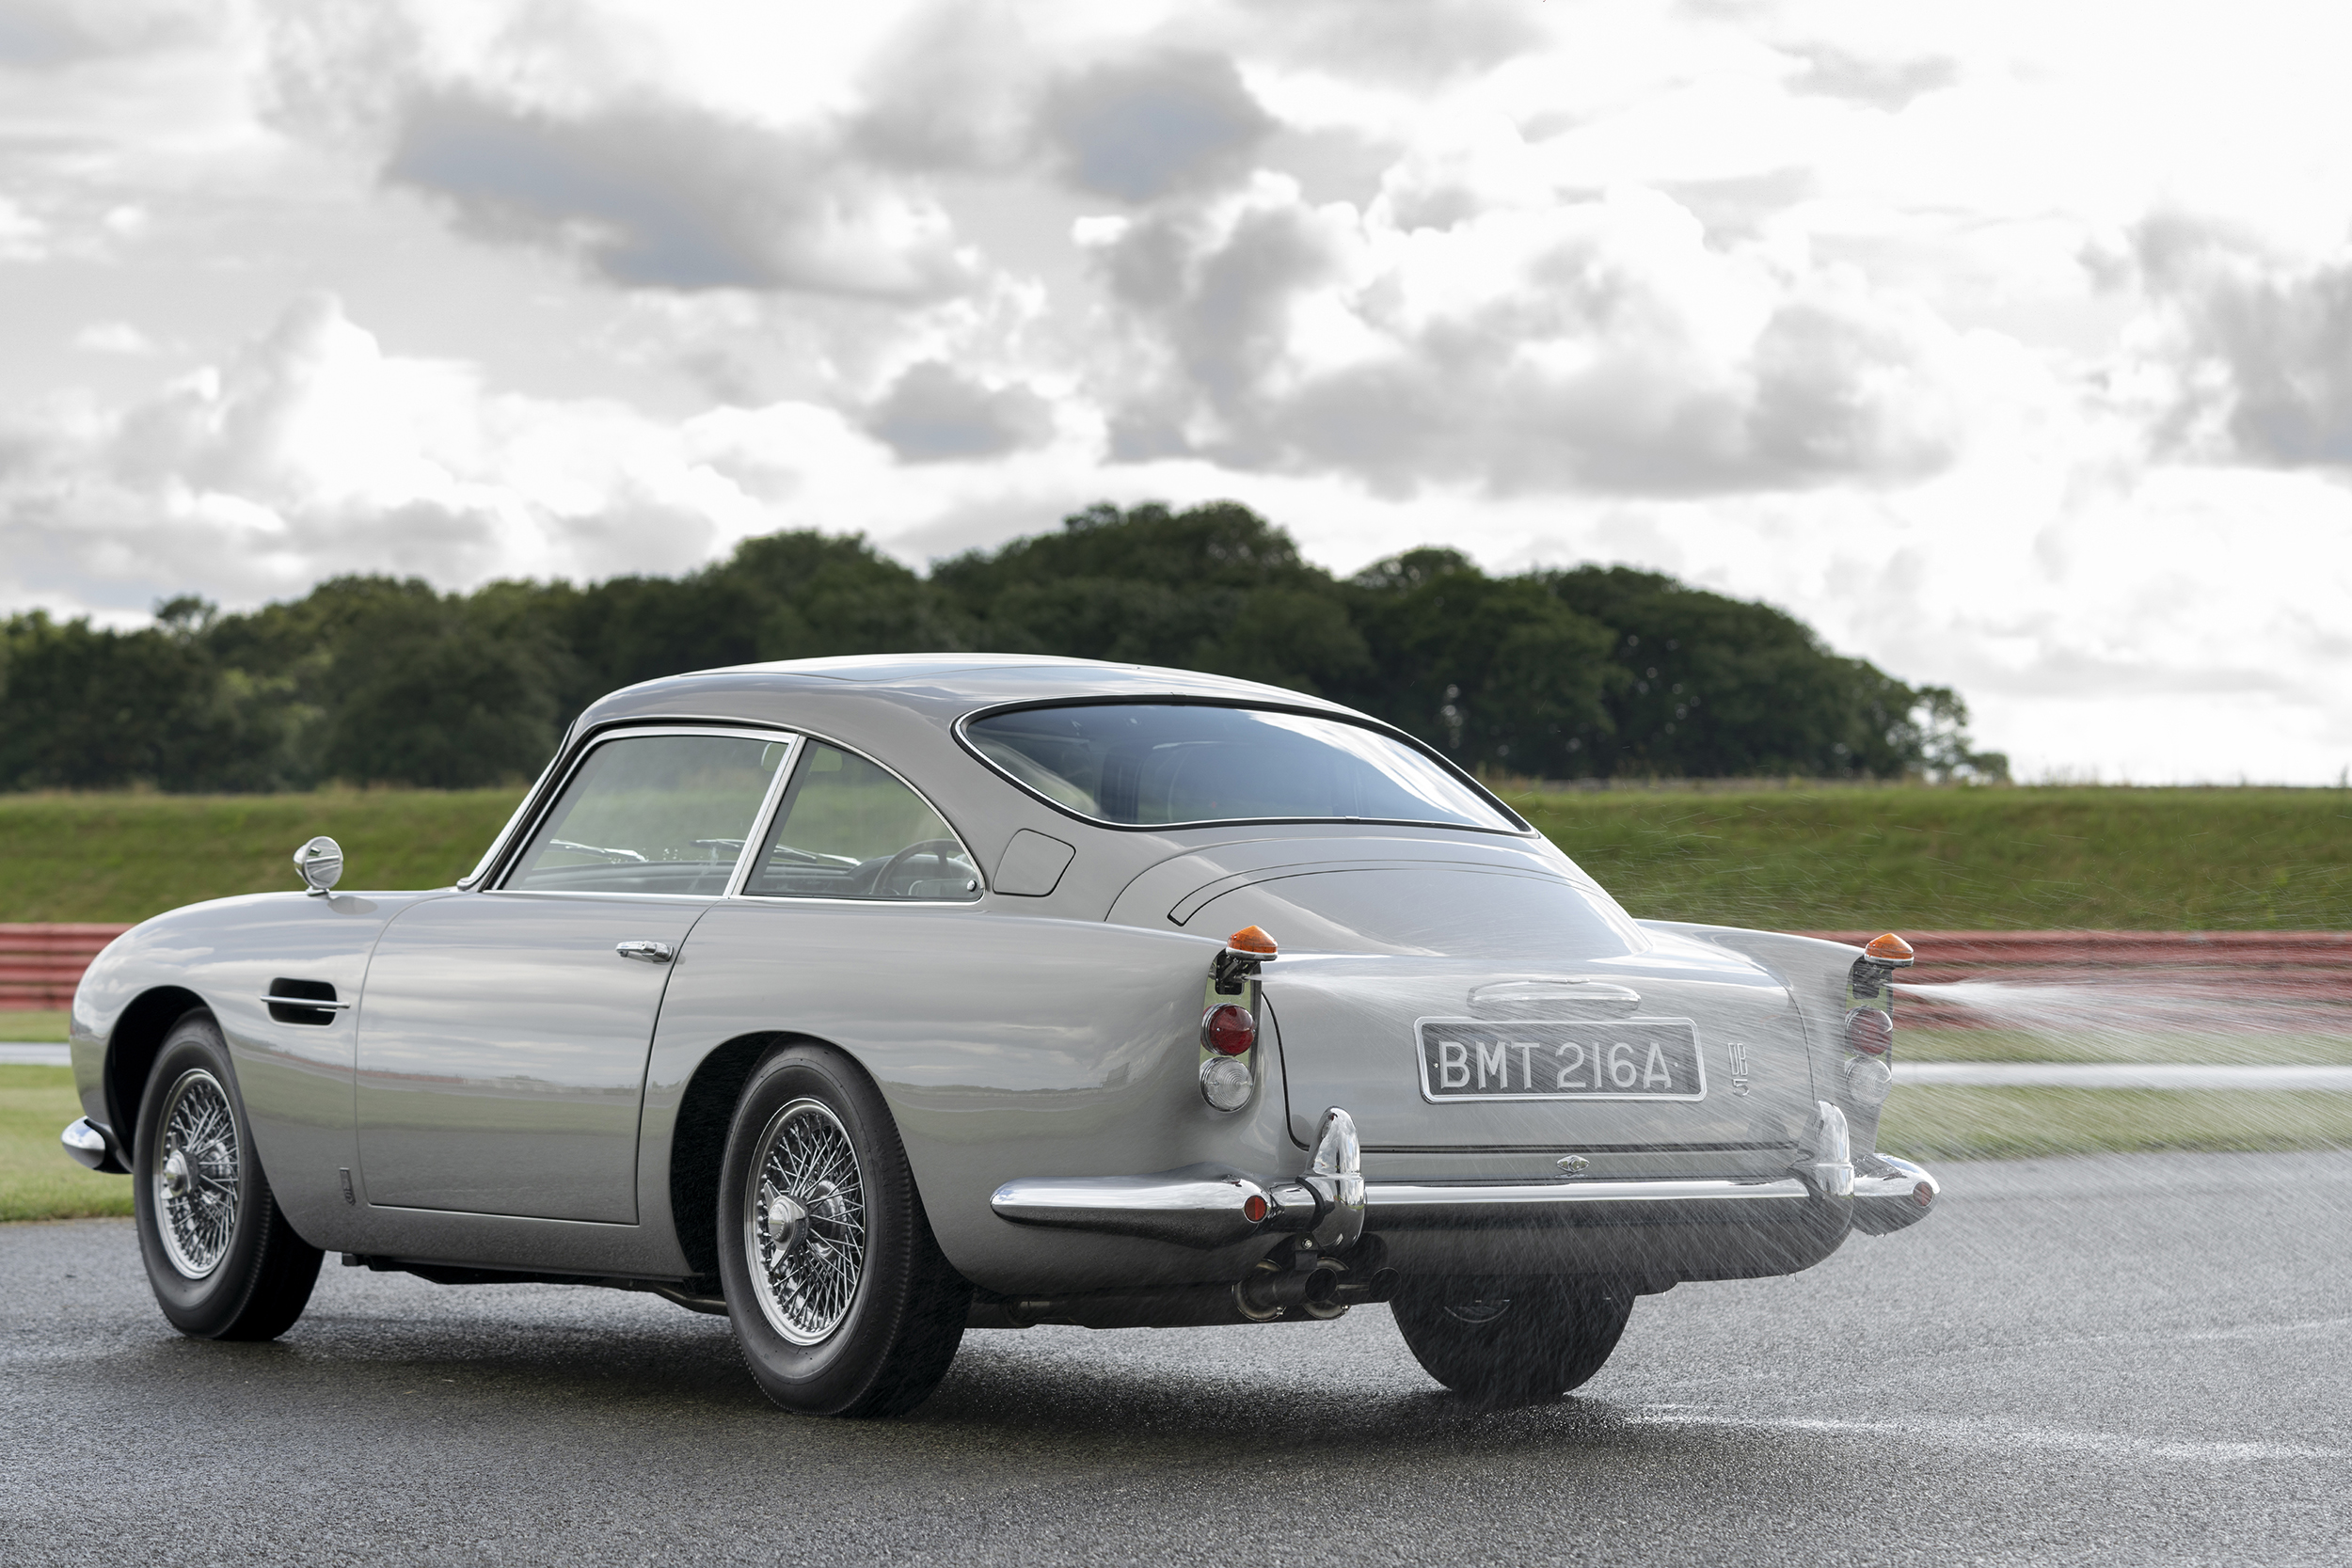 Aston_Martin_DB5_Goldfinger_Continuation21-jpg-1